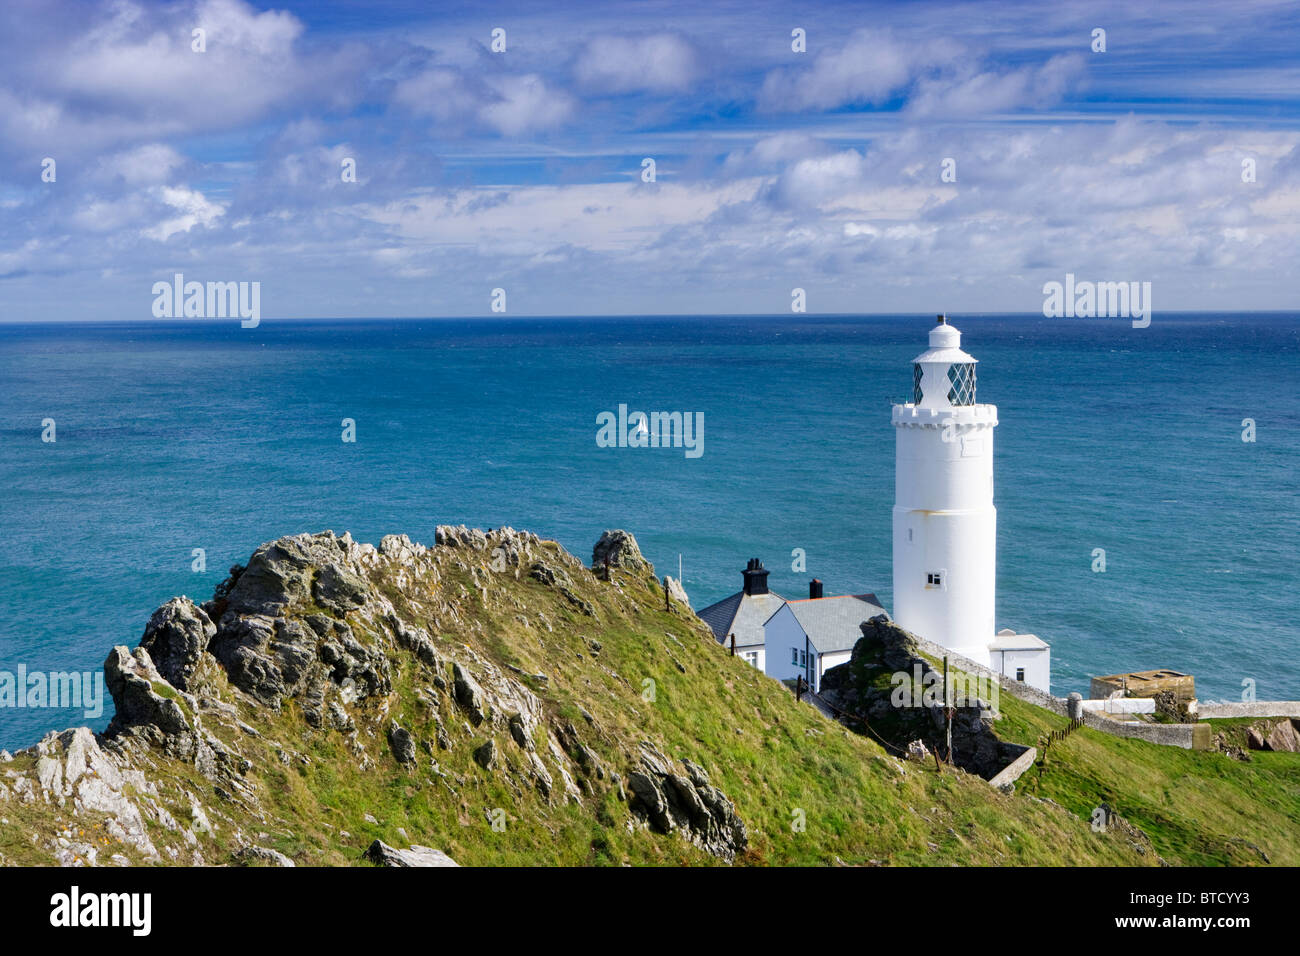 Start Point lighthouse near Salcombe, Devon, UK. - Stock Image